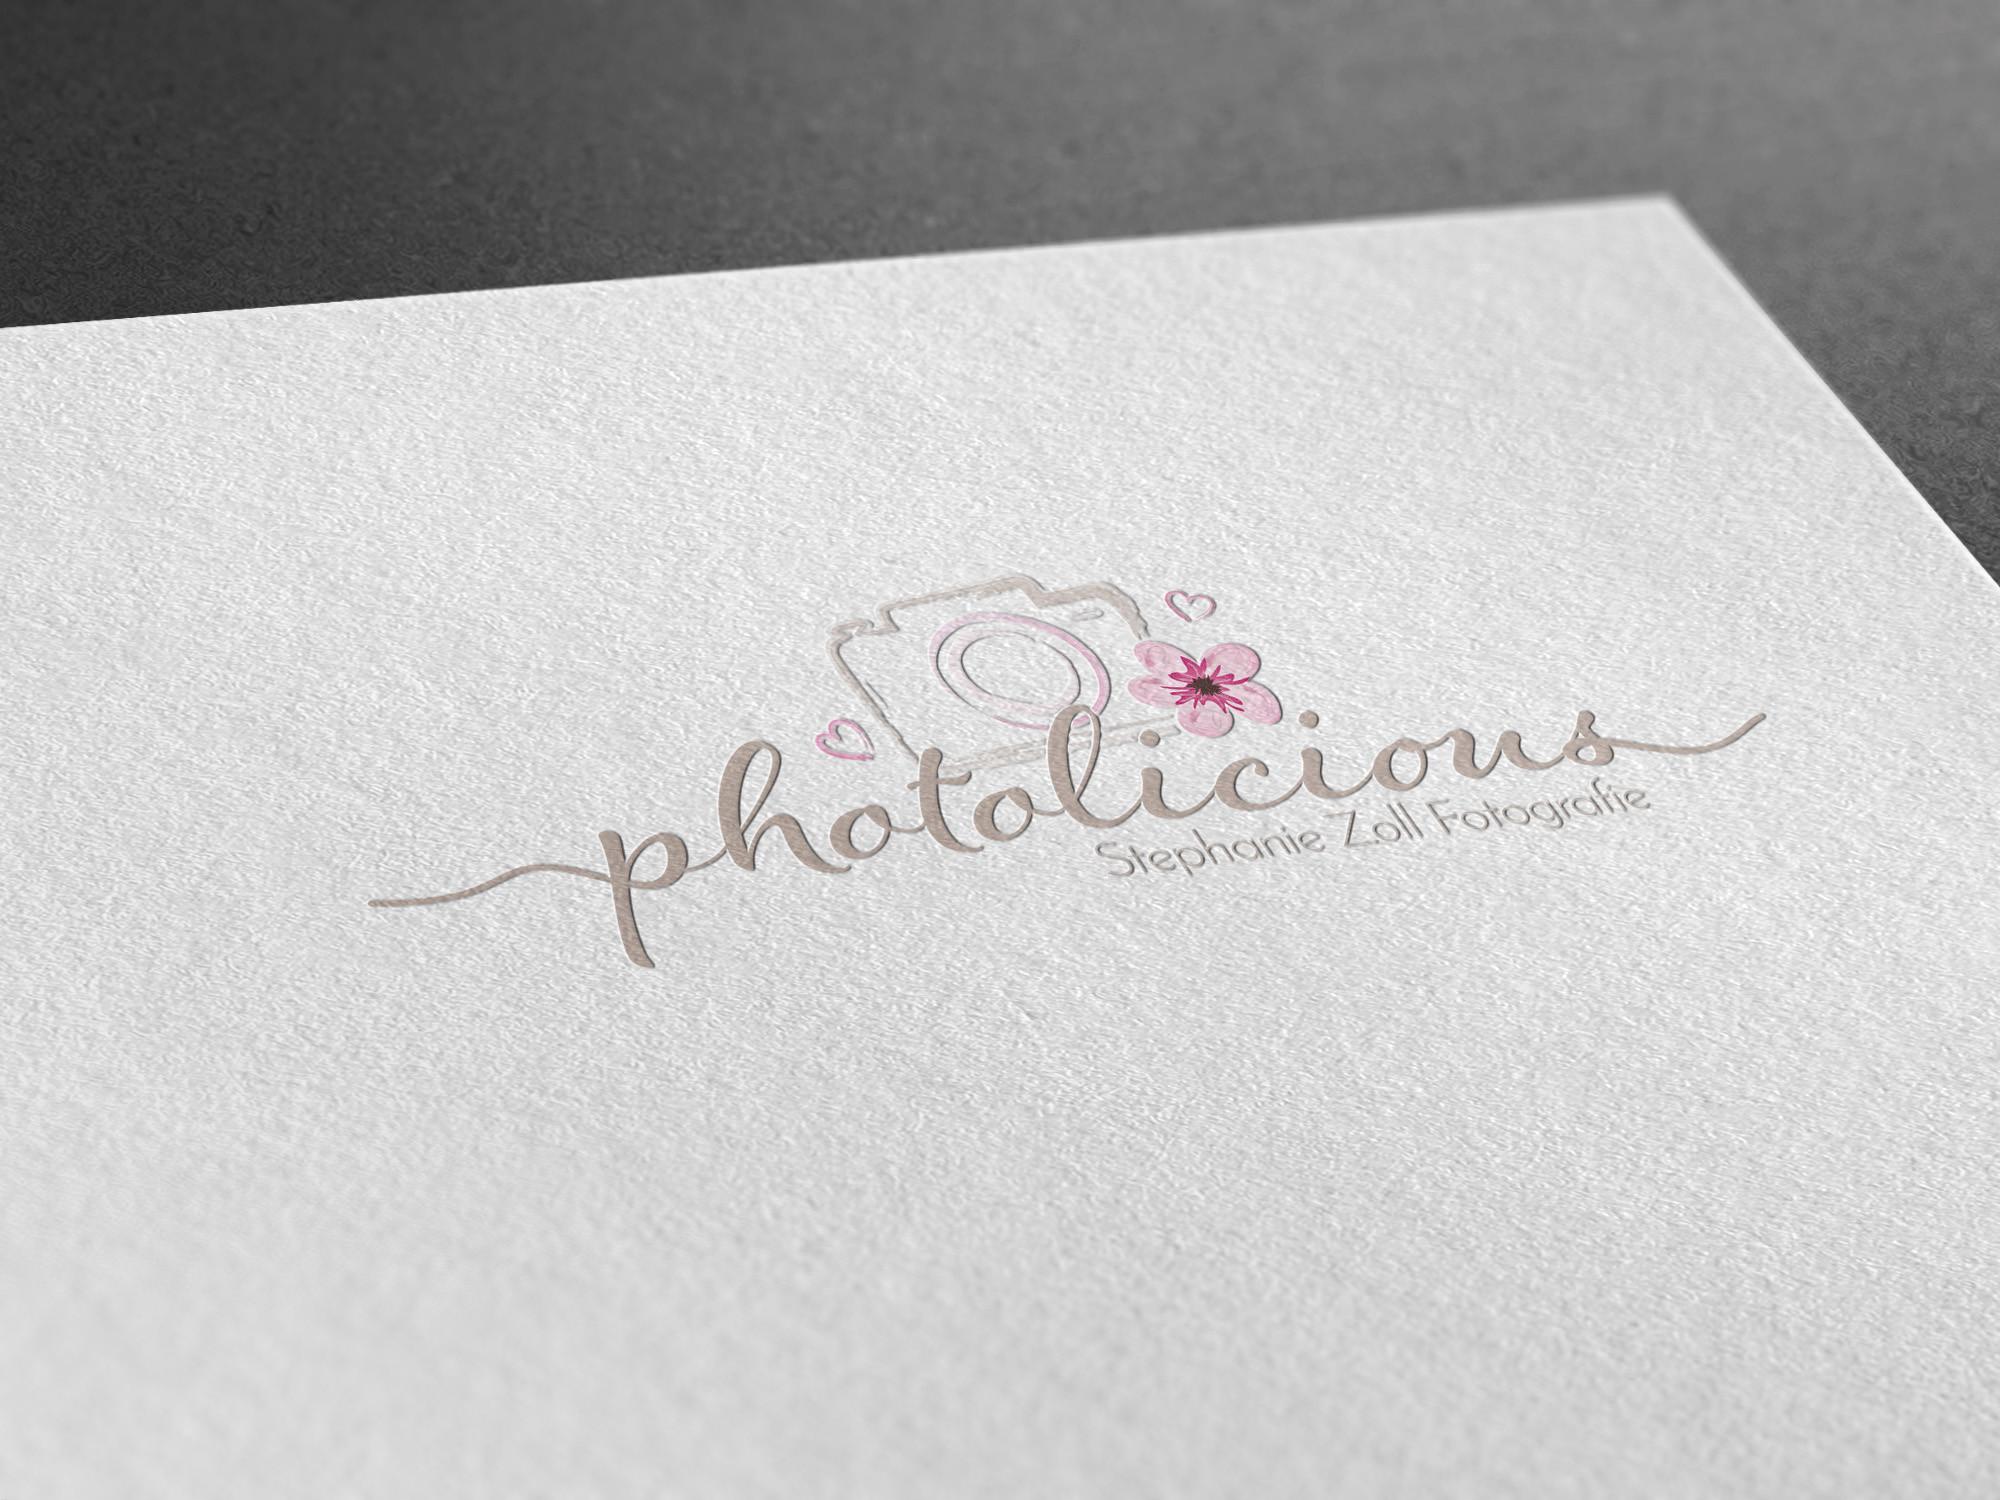 Logo photolicious visualisiert